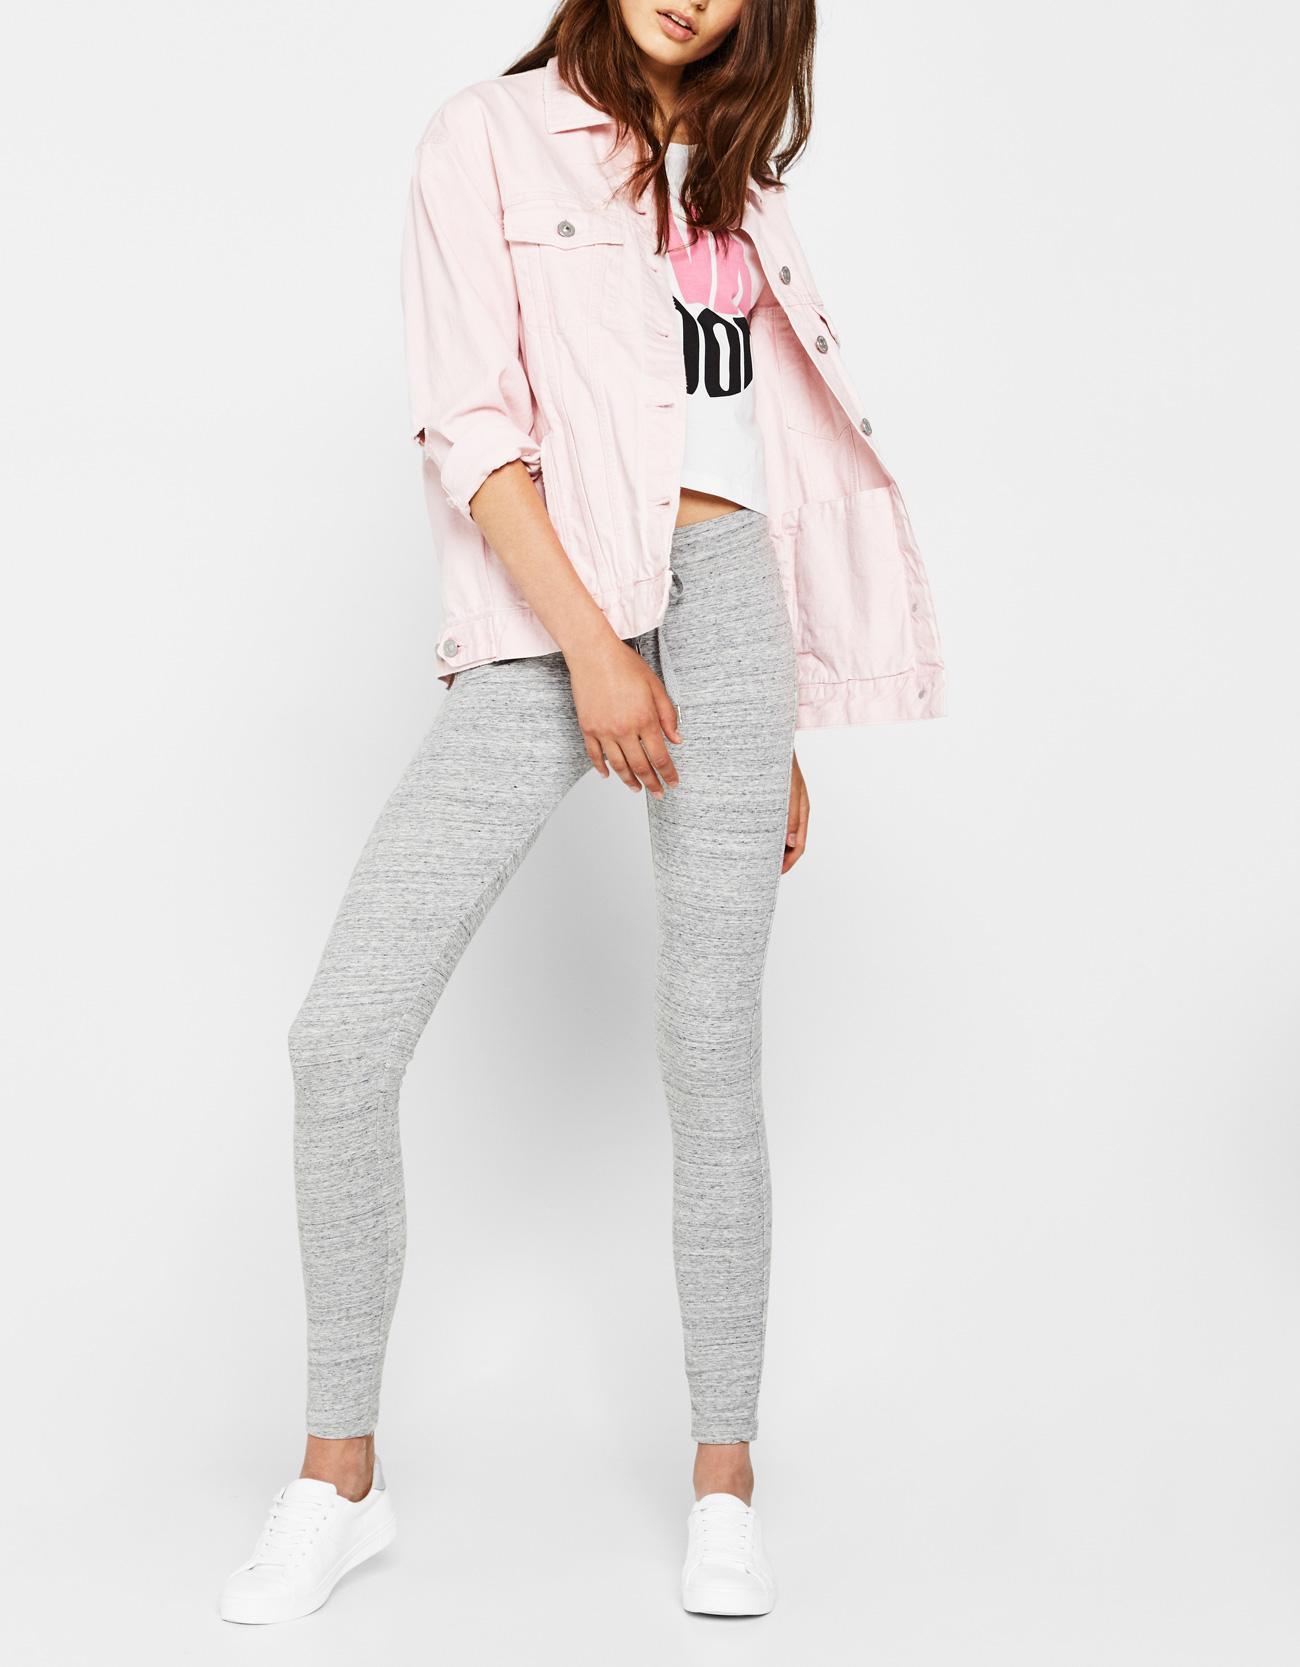 158e7c80 Buy Bershka Womens Clothing at Best Prices Online in Pakistan - daraz.pk